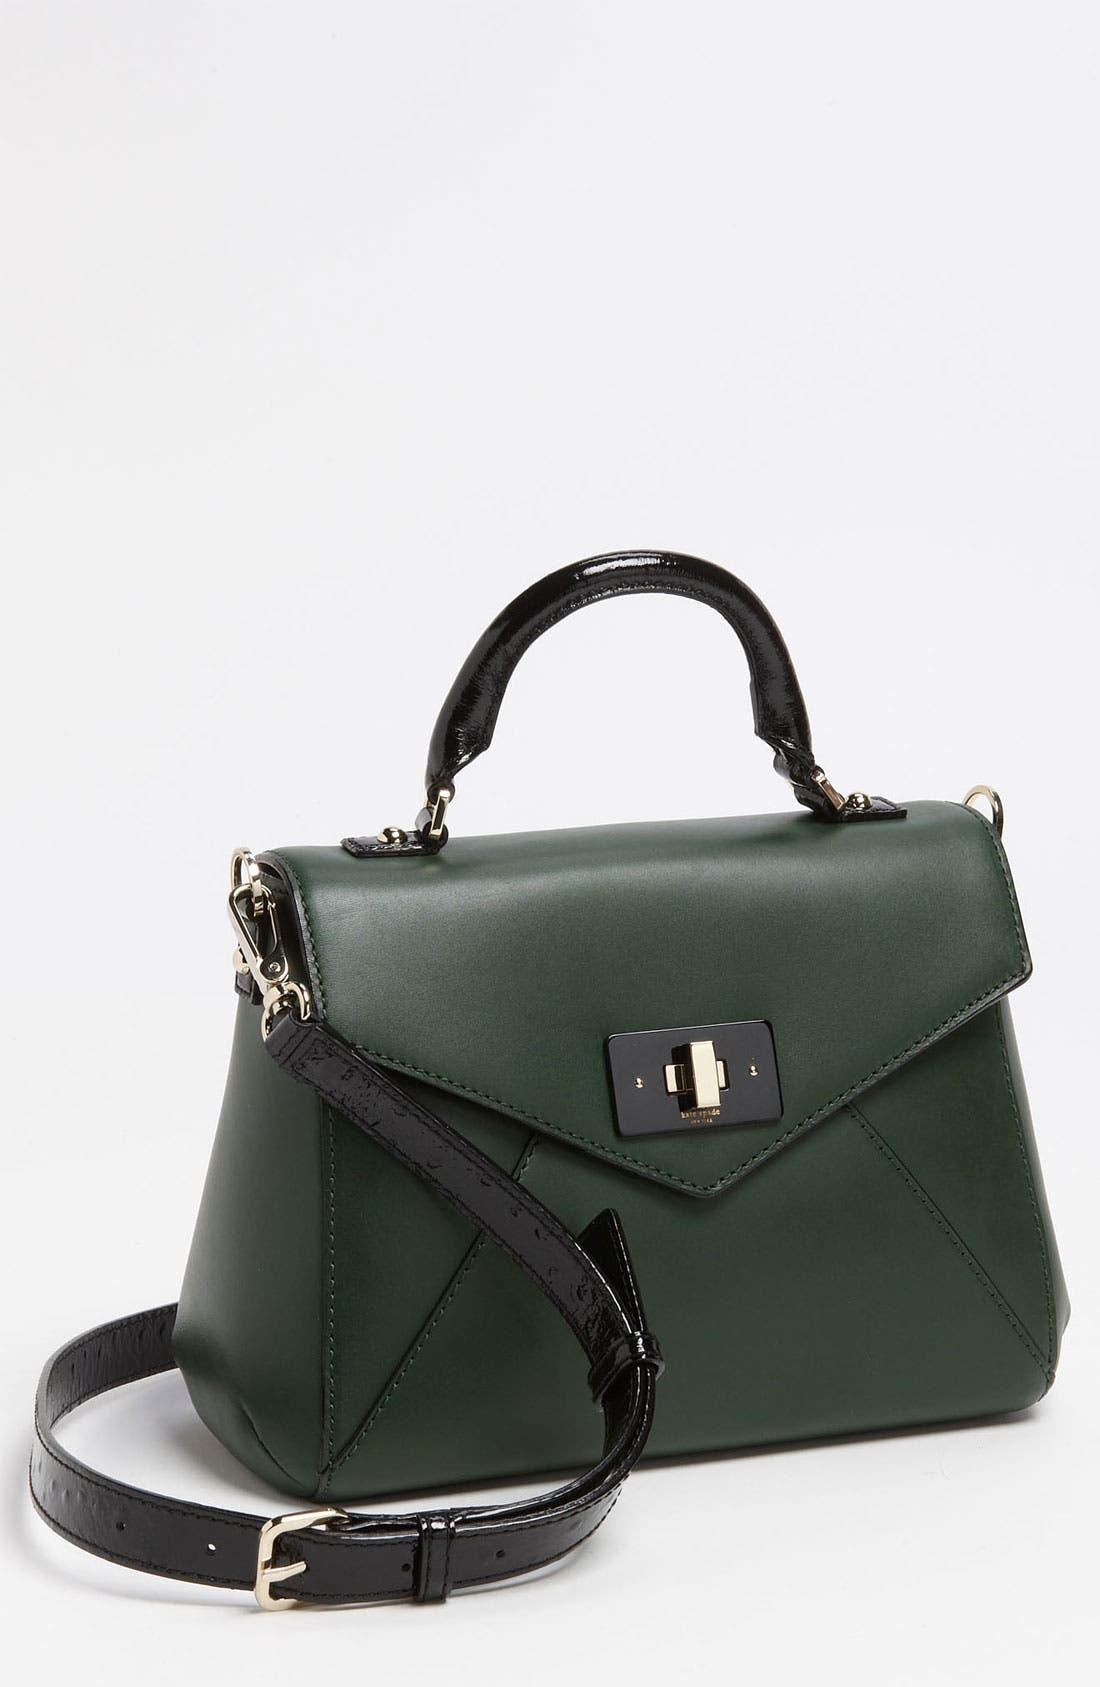 Main Image - kate spade new york 'post street - little nadine' satchel